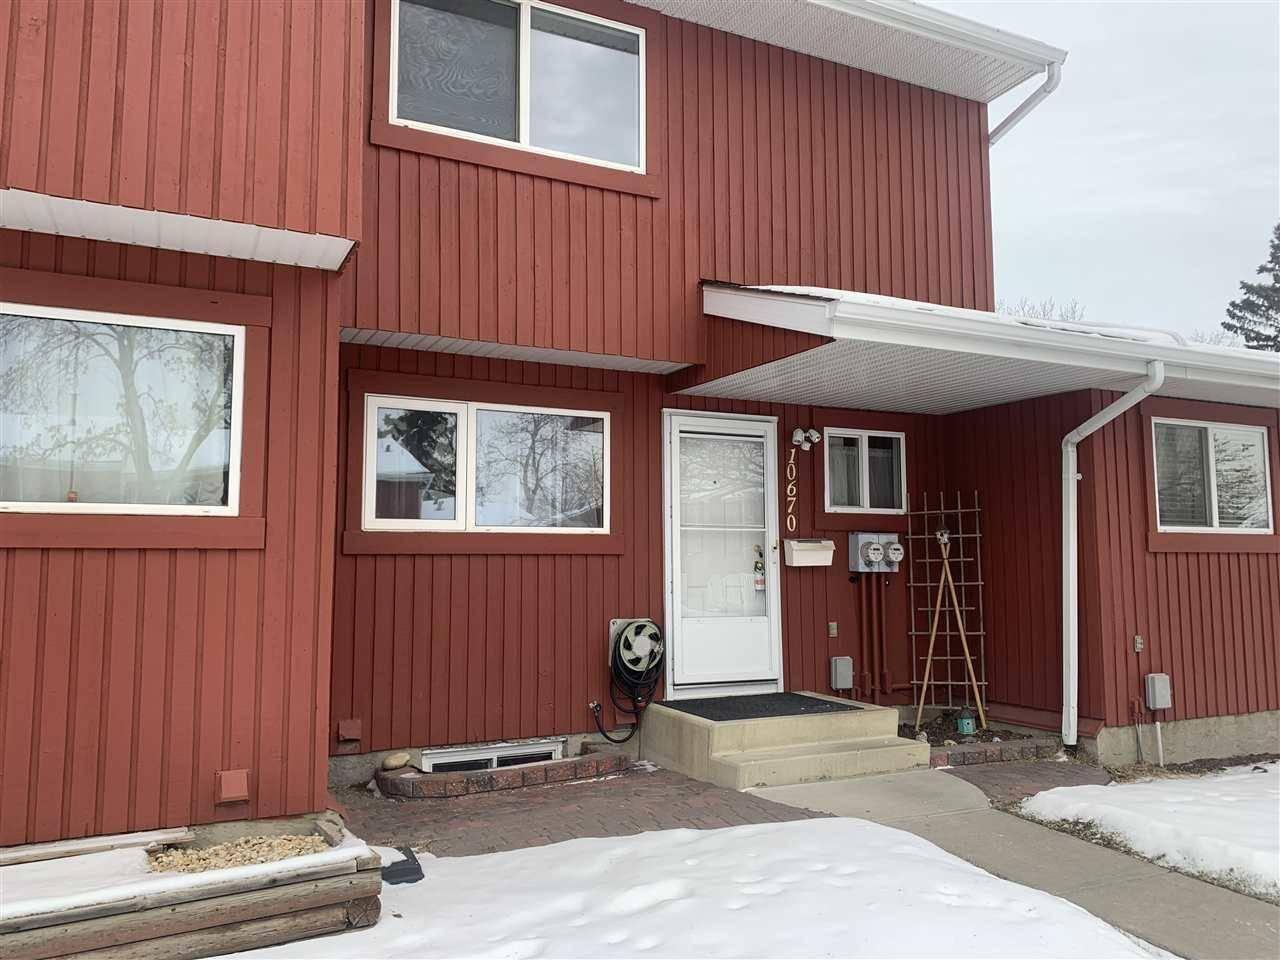 Townhouse for sale at 10670 Beaumaris Rd Nw Edmonton Alberta - MLS: E4178193